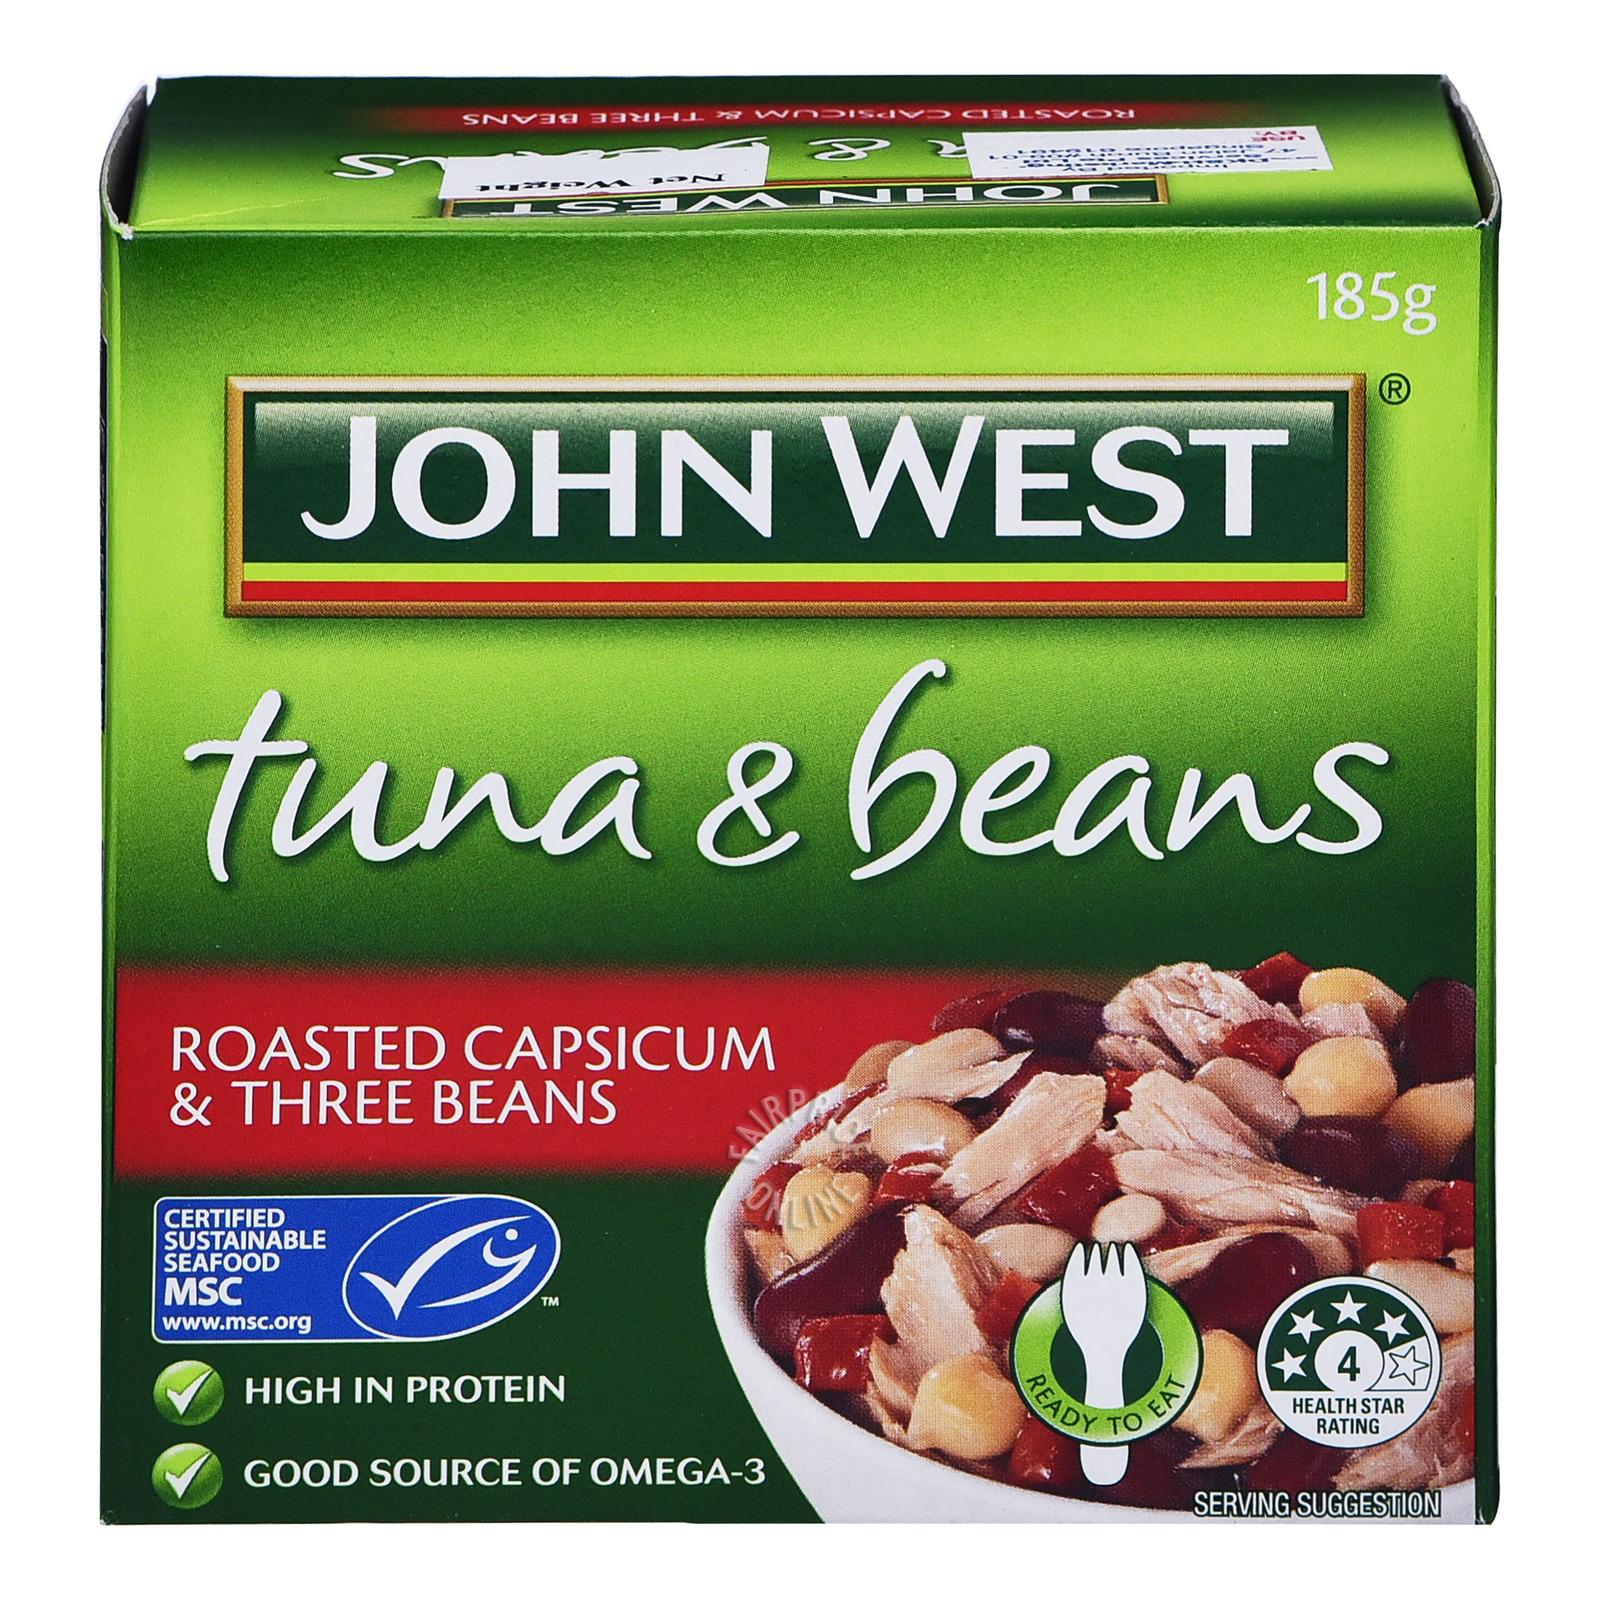 John West Tuna & Beans - Rosted Capsicum & Three Beans